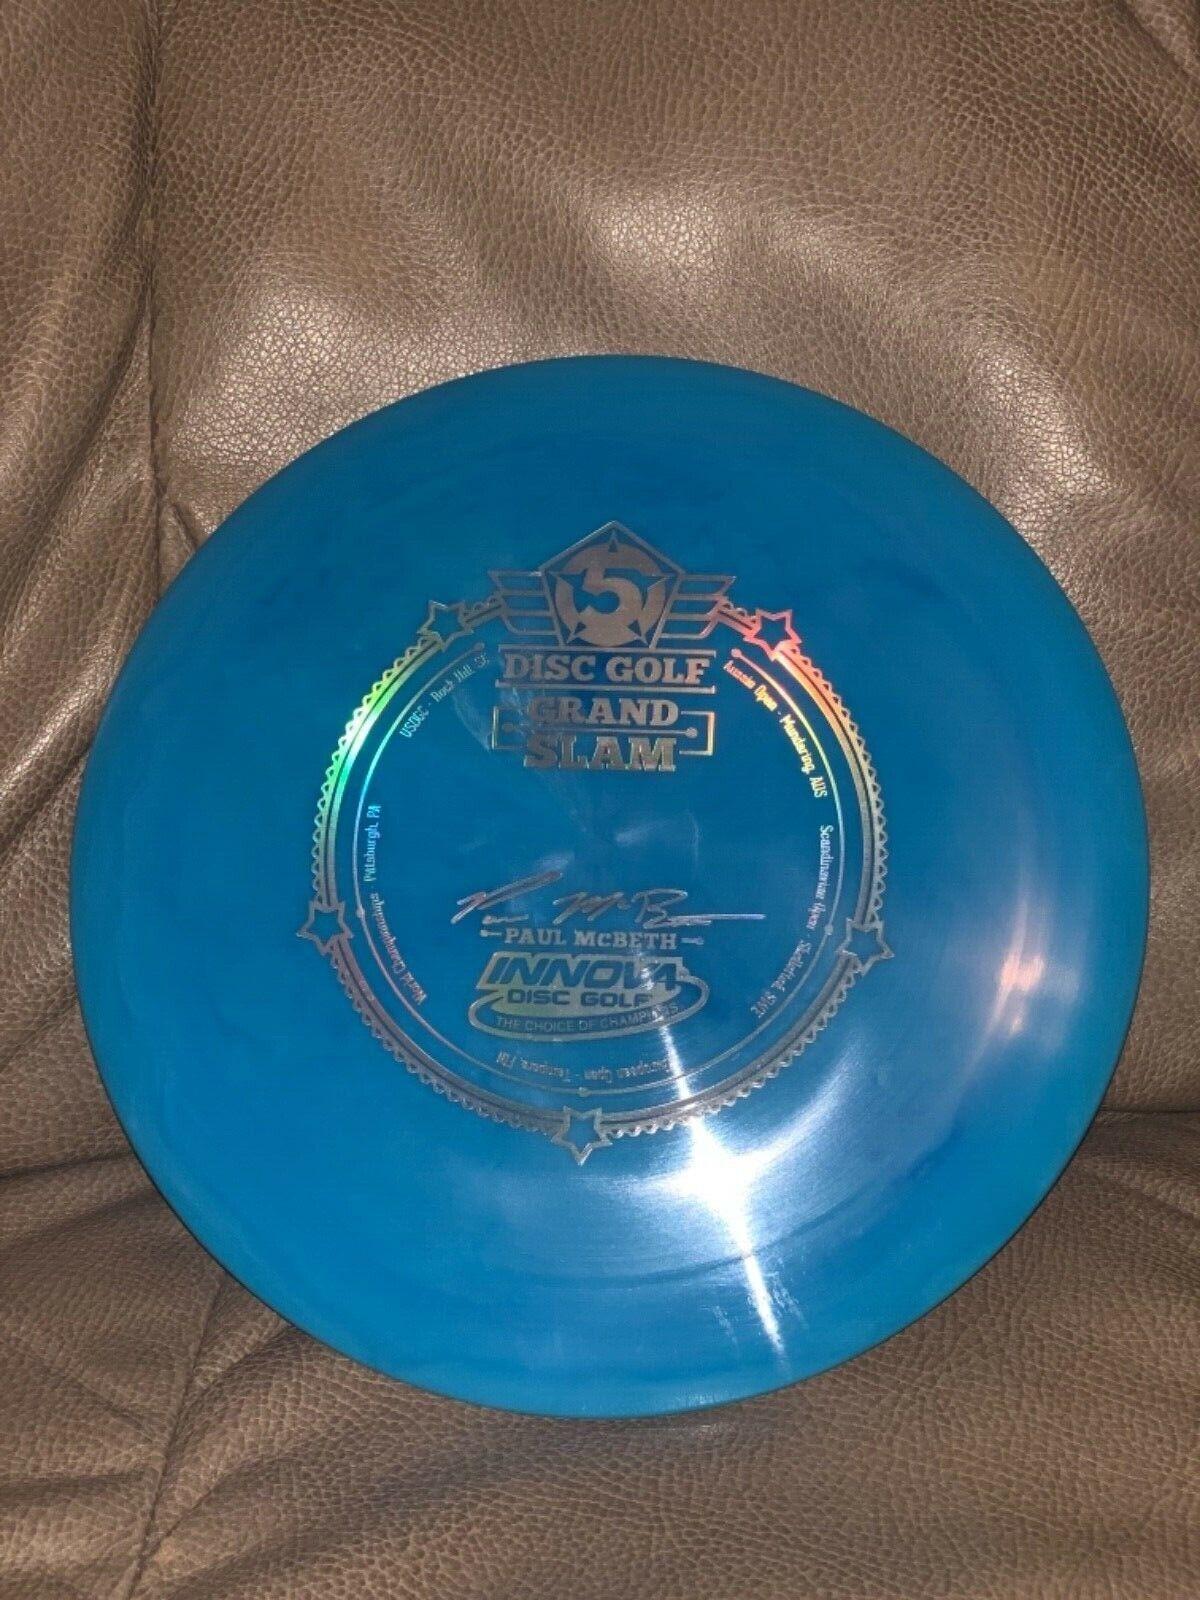 Innova McBeth Grand Slam Star Destroyer 175g Swirly blu w Holo Stamp NEW